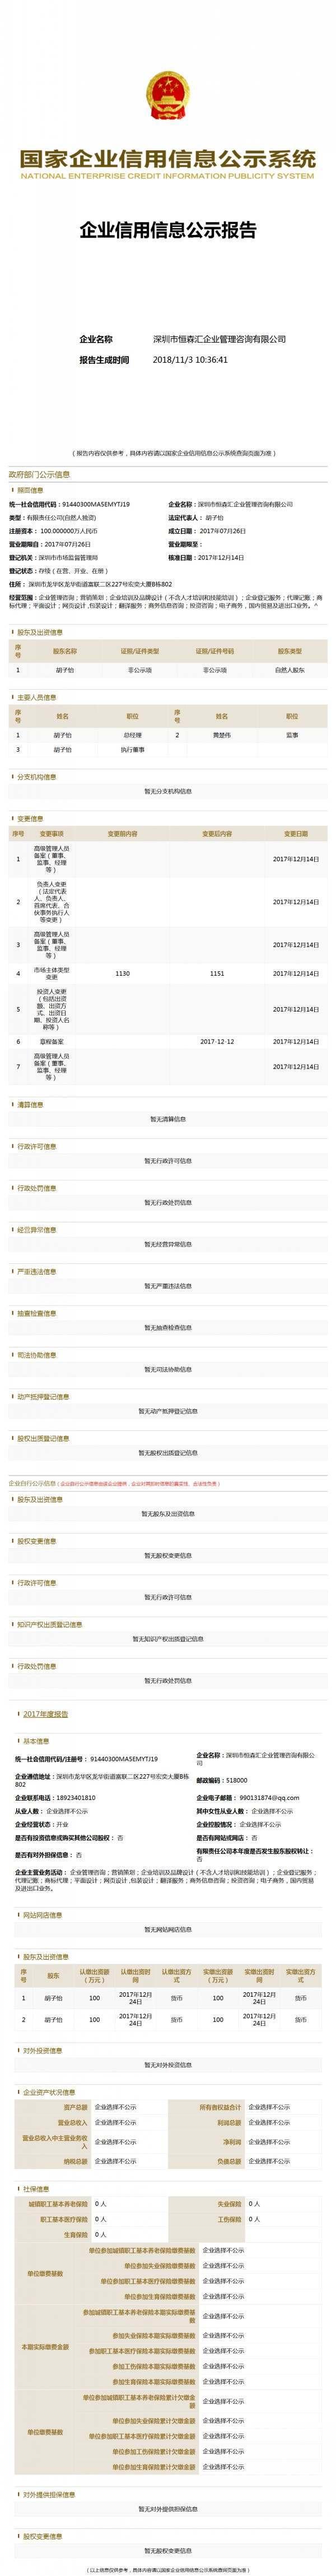 conew_深圳市恒森汇企业管理咨询有限公司[1]